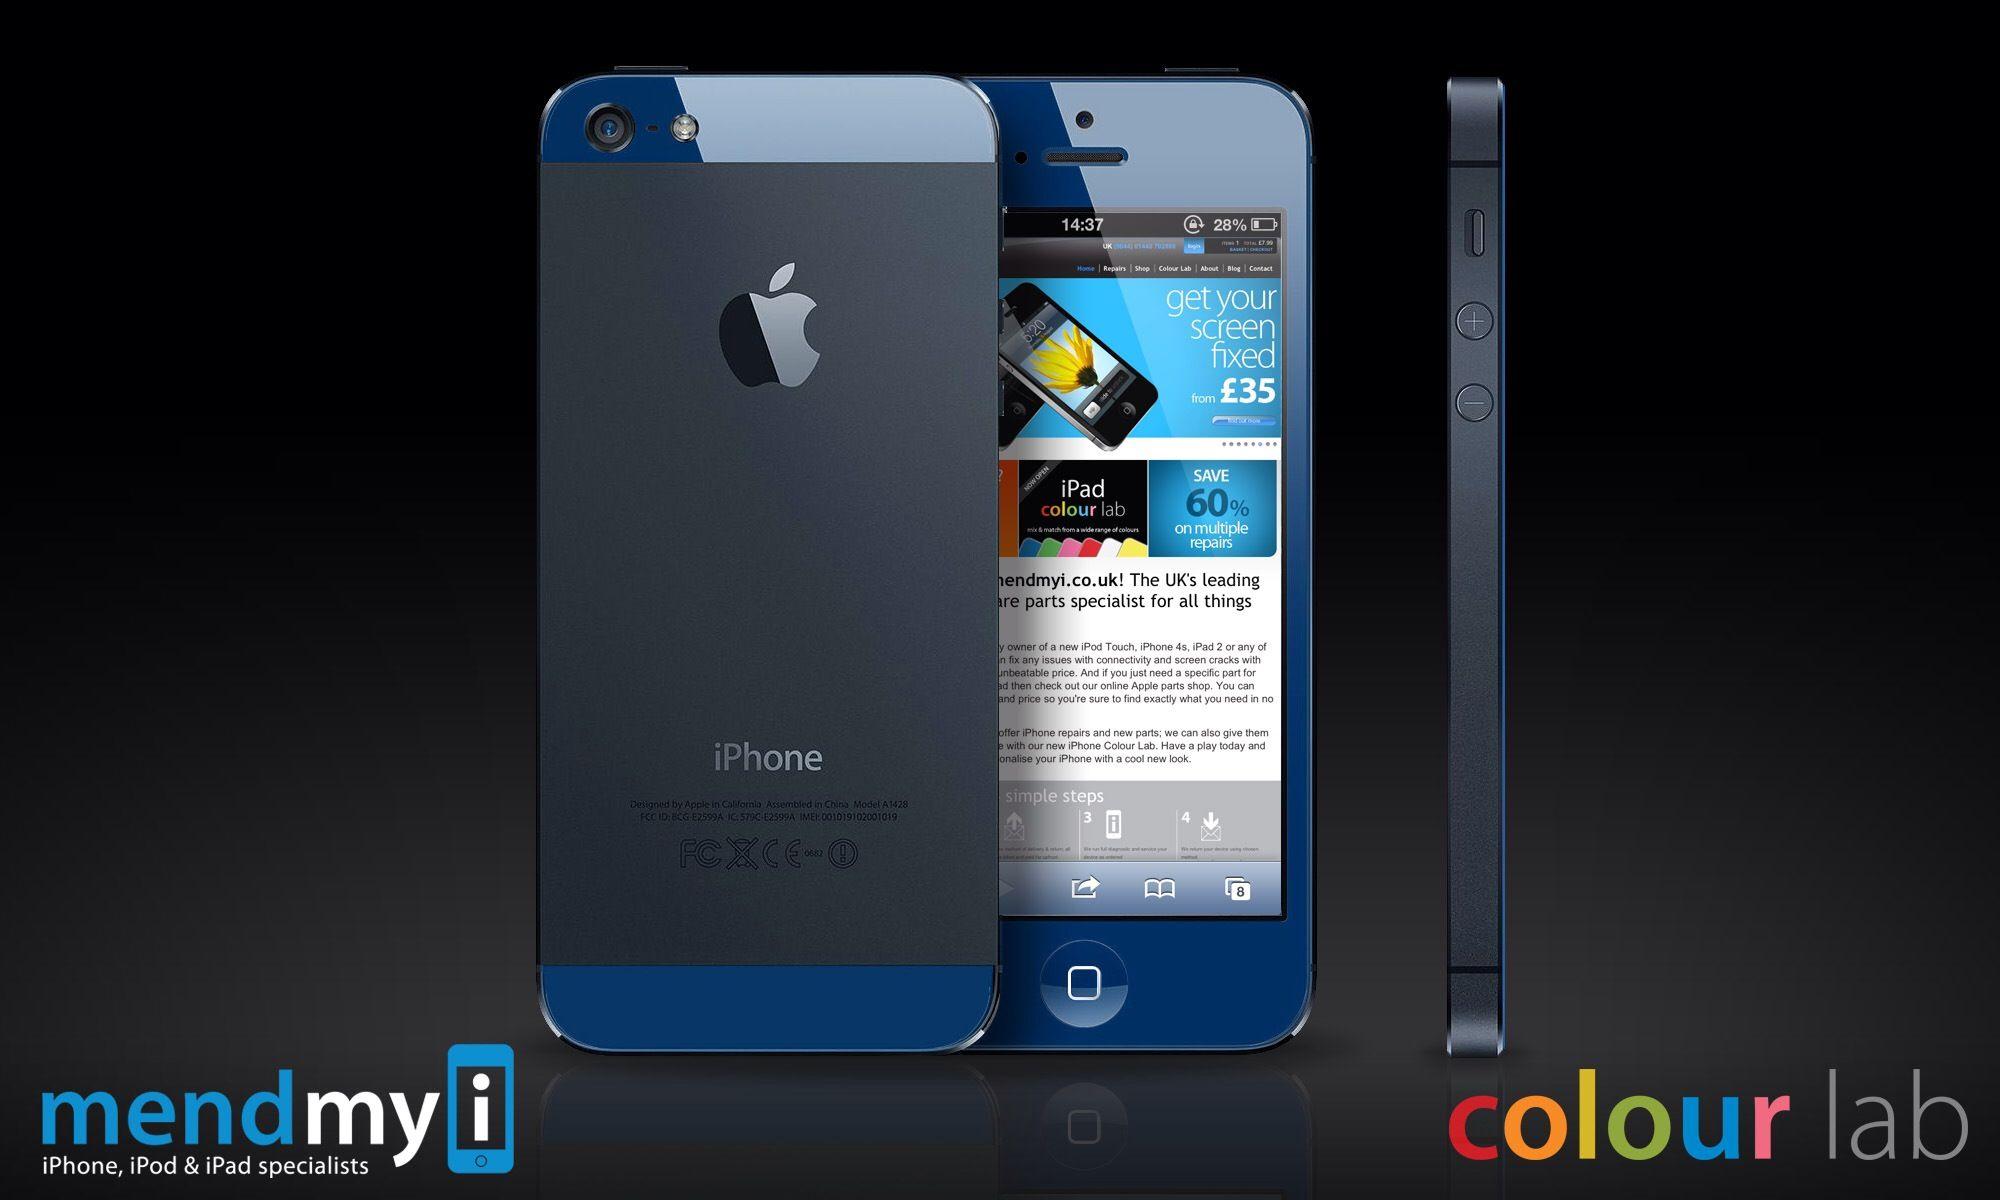 Www etradesupply com media uploaded iphone 5c vs iphone 5 screen jpg - Iphone 5 Colourlab Dark Blue And Black